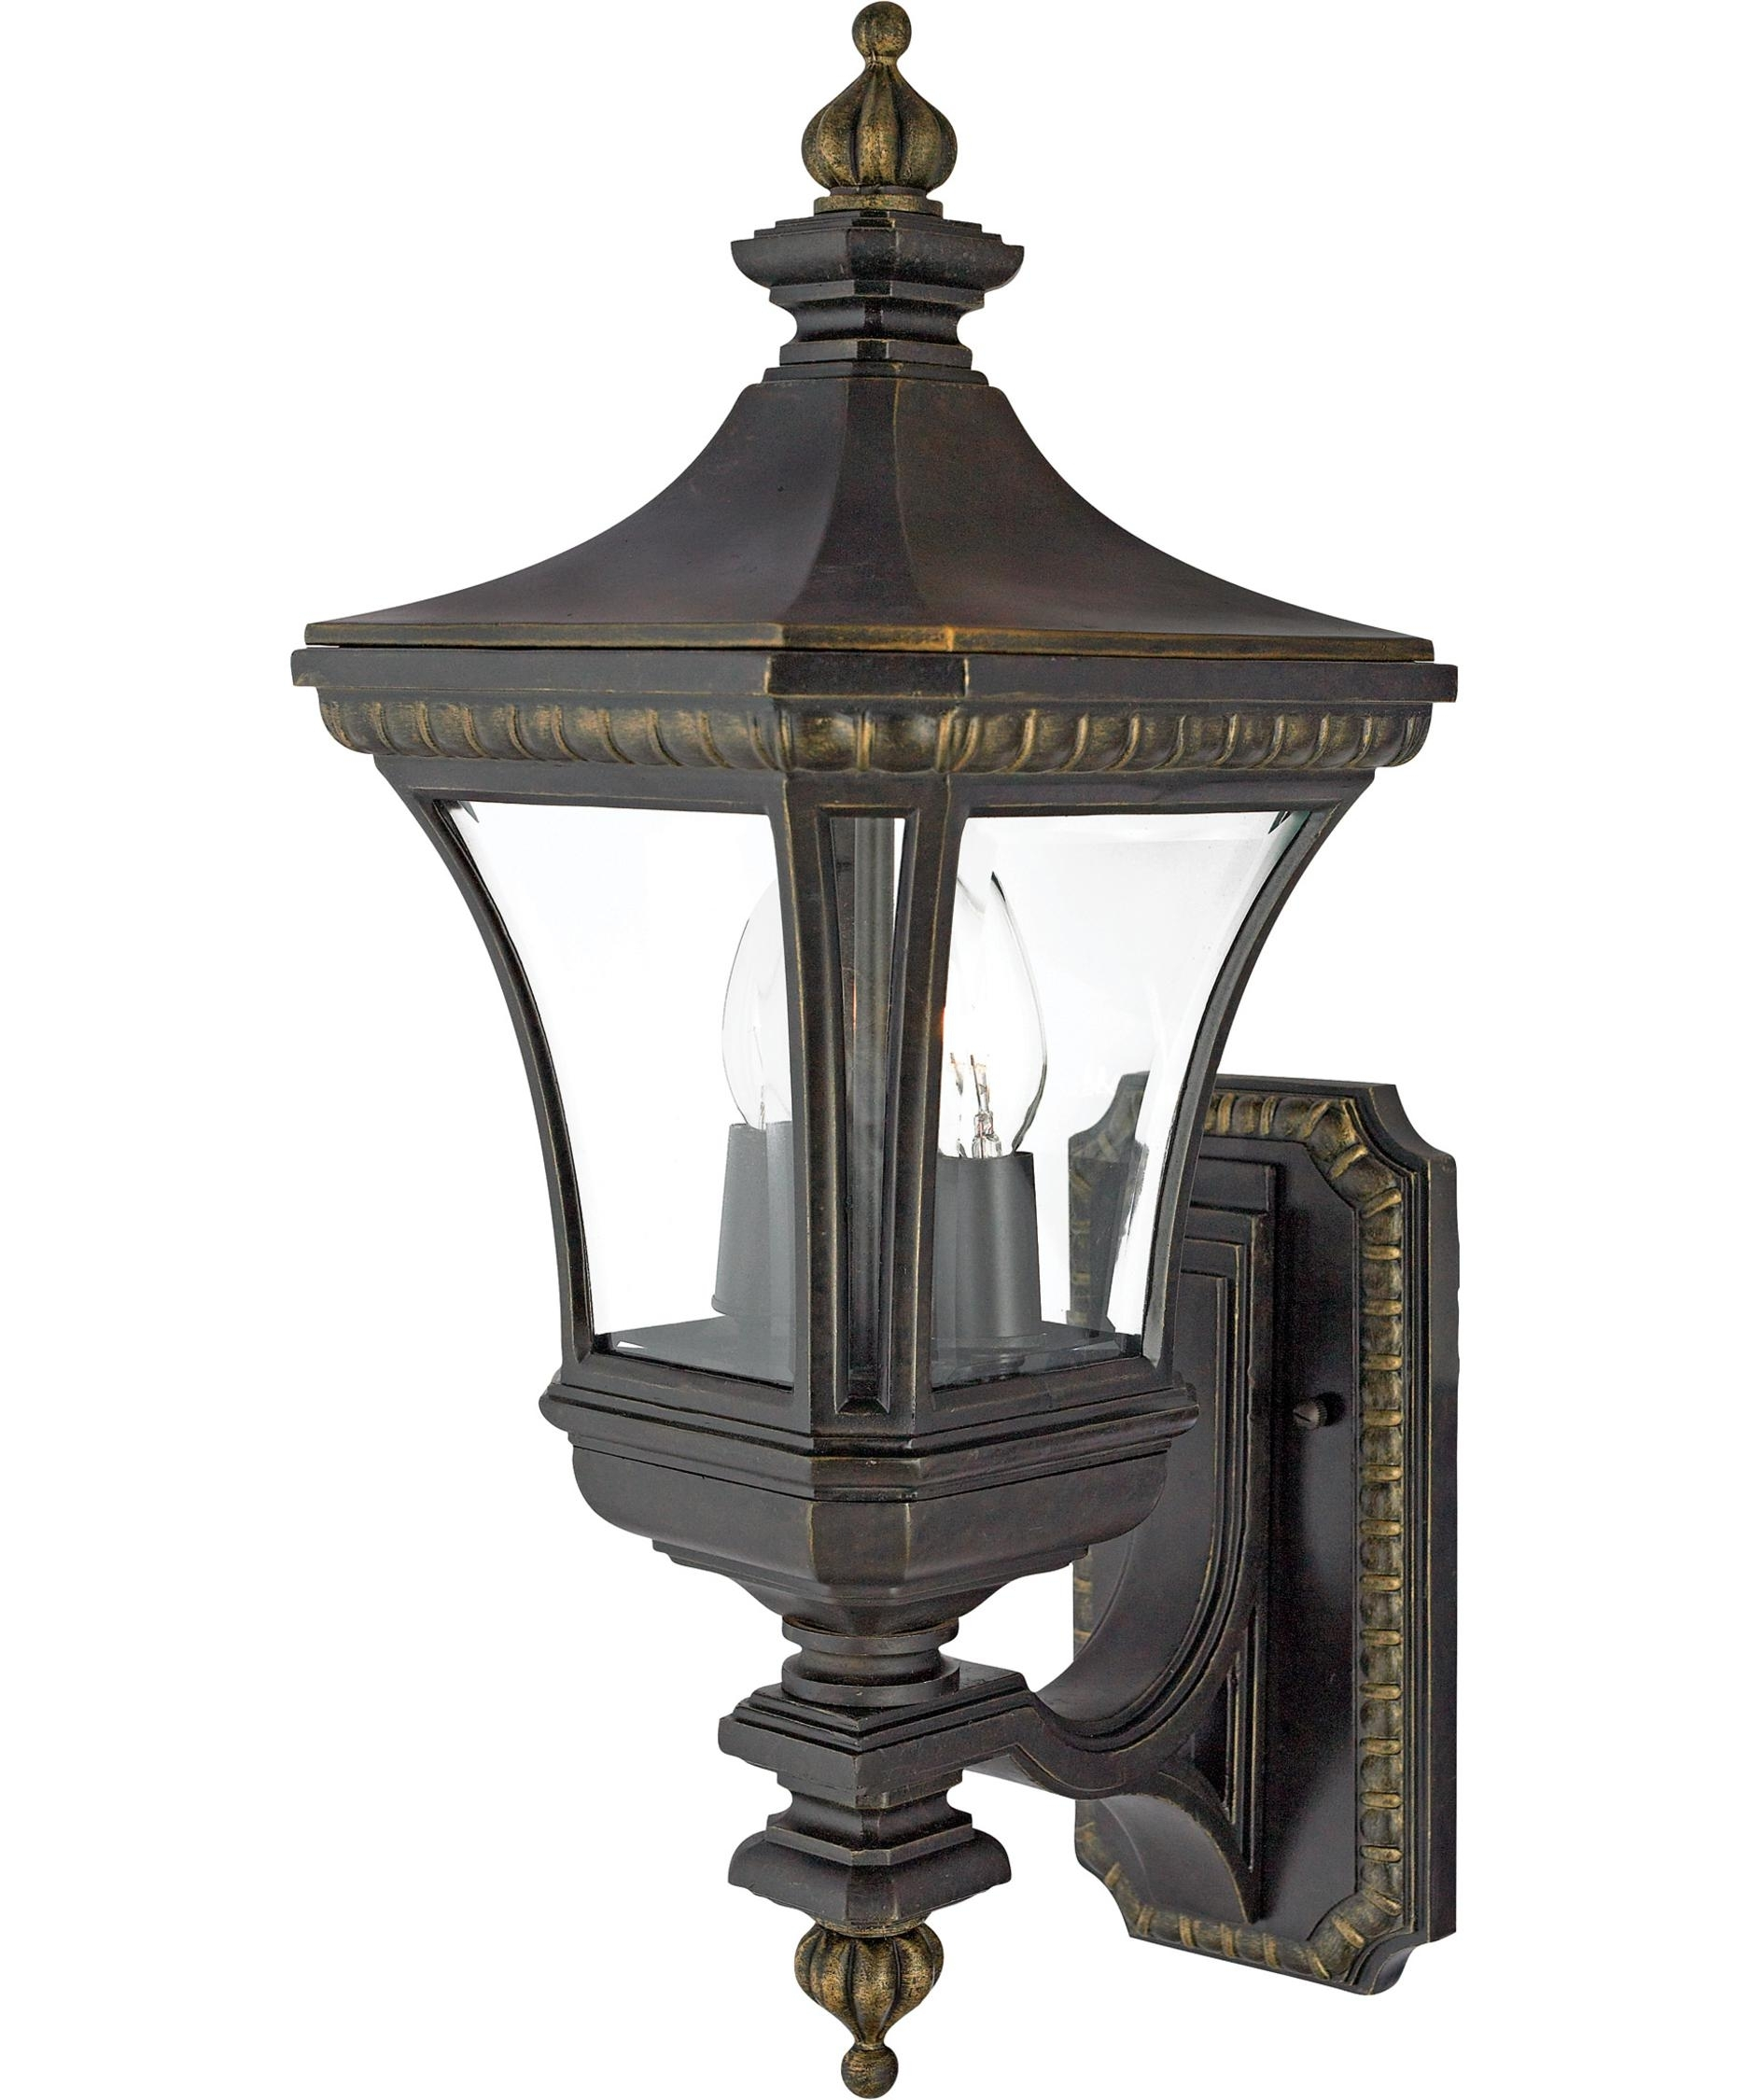 1940S Porch Light Victorian Lamp Post Antique Lights 1920S Outdoor Regarding Victorian Outdoor Lanterns (Photo 17 of 20)